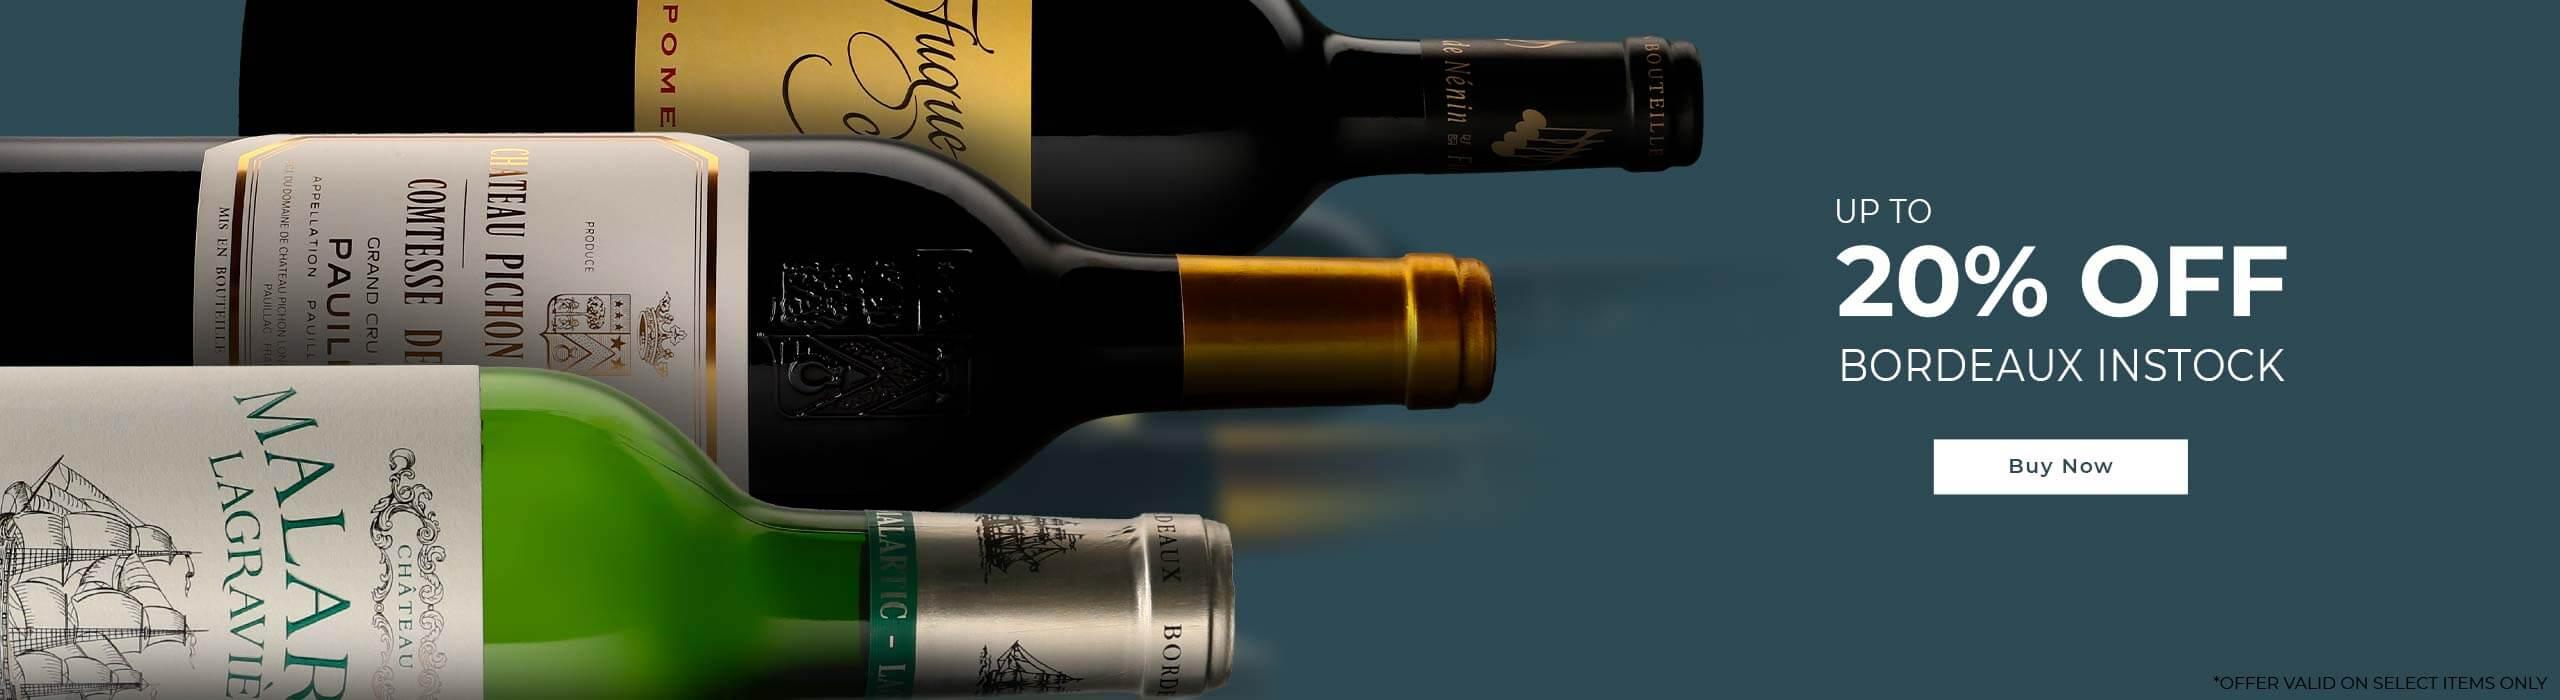 Instock Bordeaux flash offer